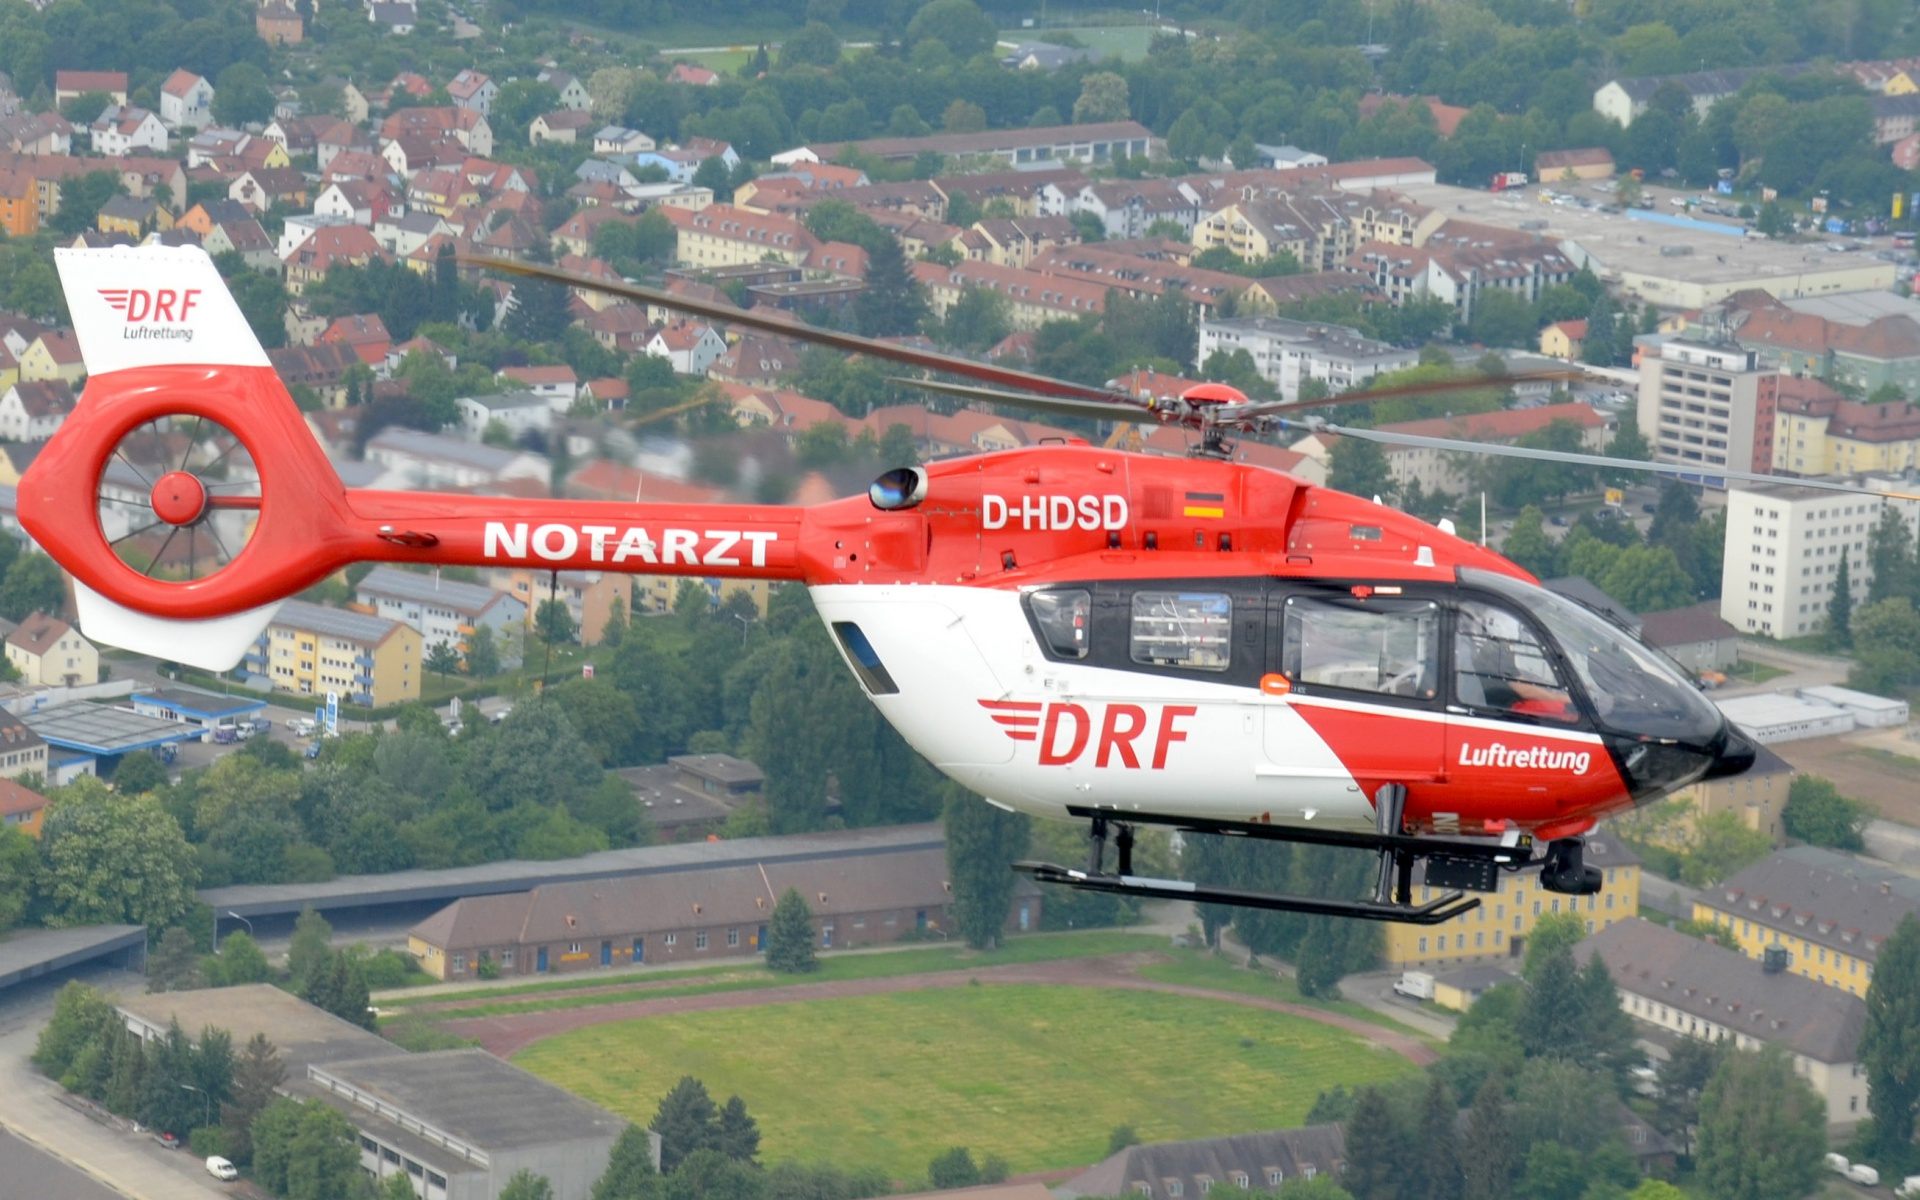 Hubschrauber über Nürnberg